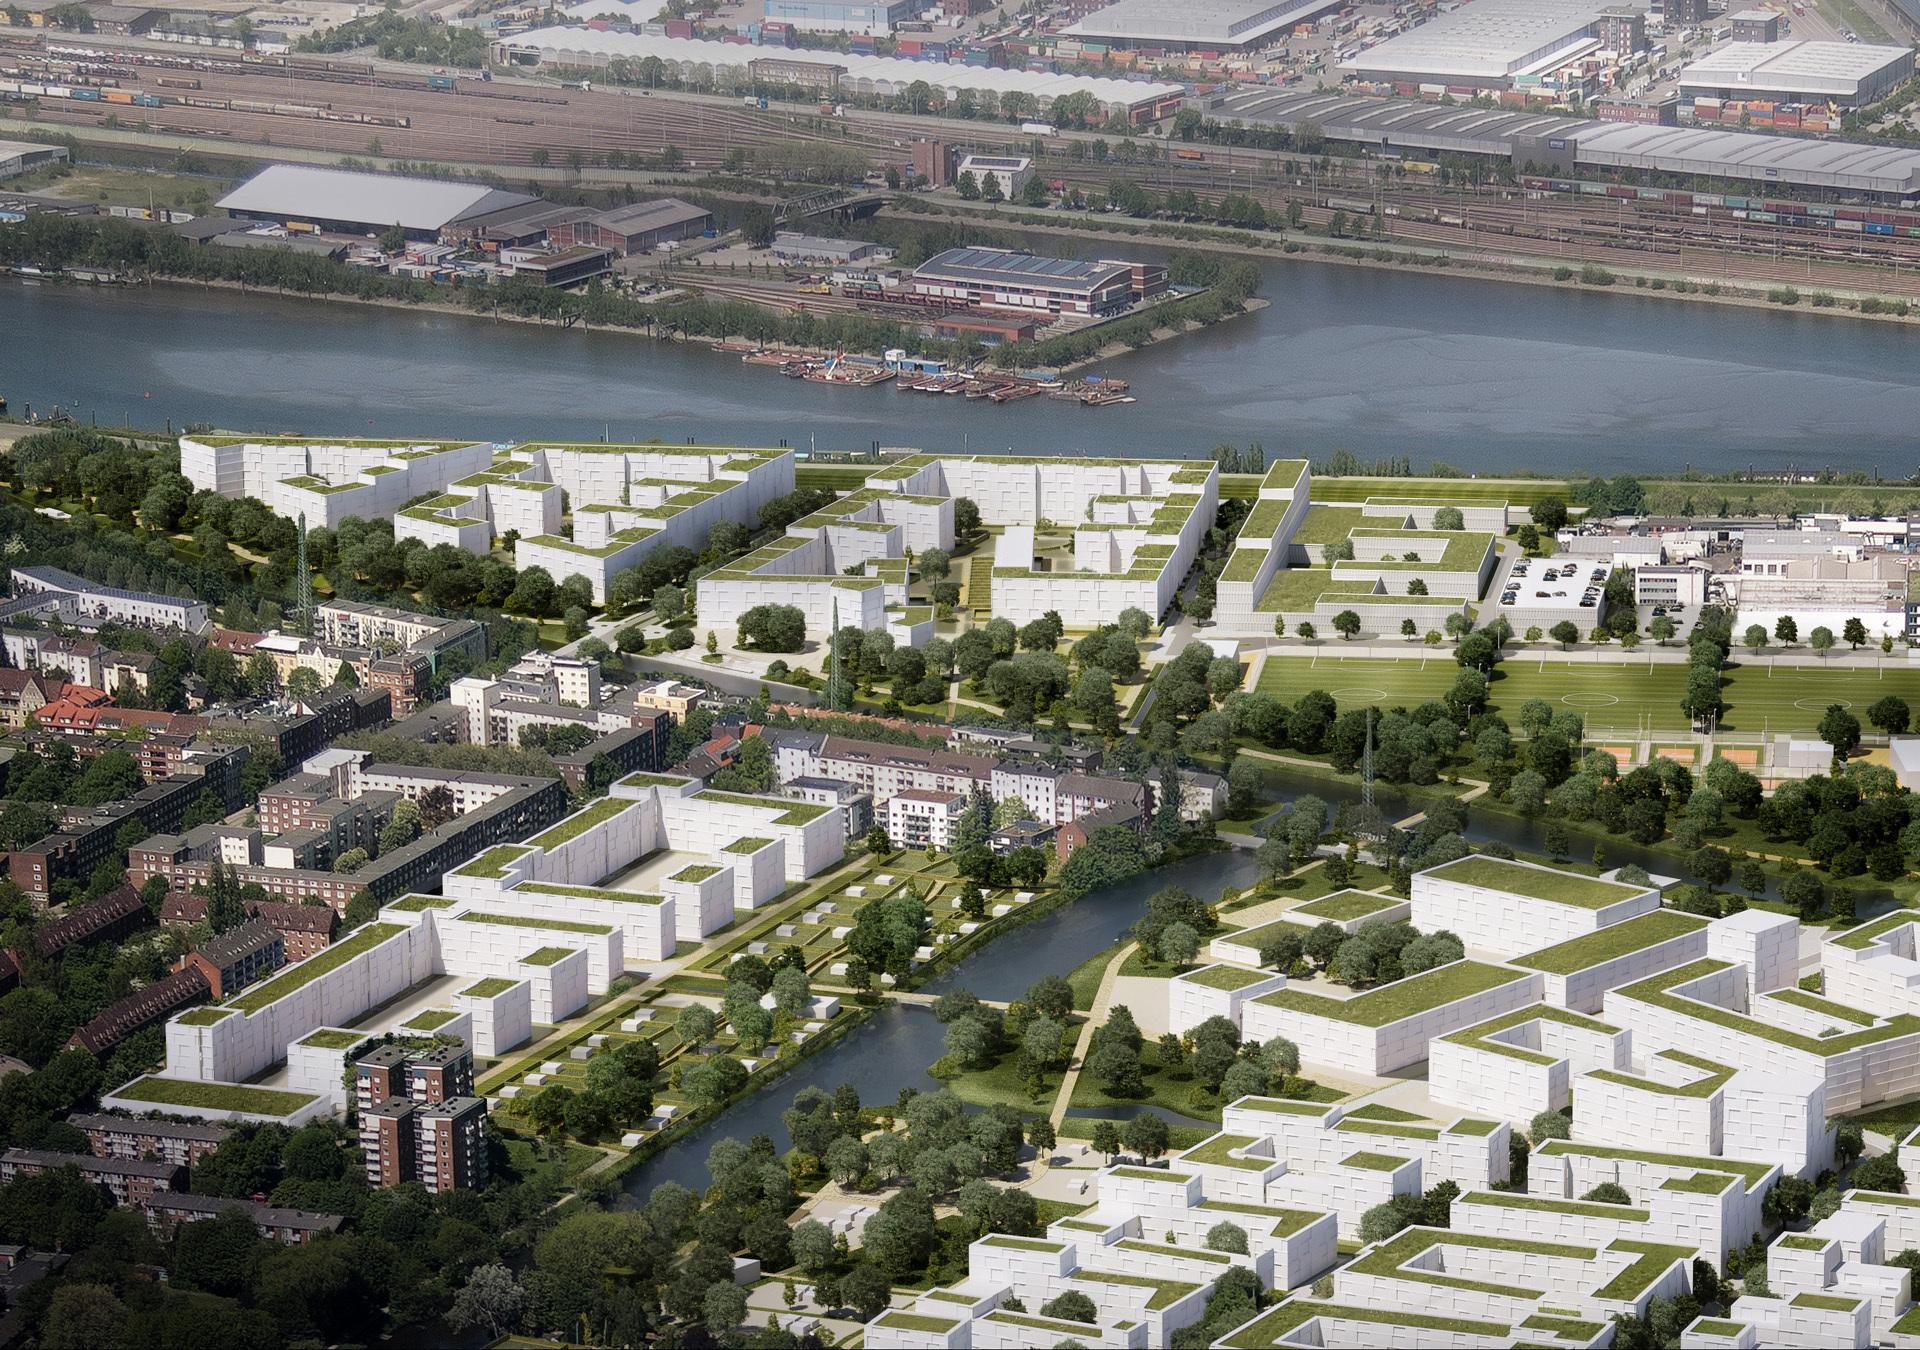 Spreehafen Luftbildvisualisierung; IBA Hamburg / Moka Studios